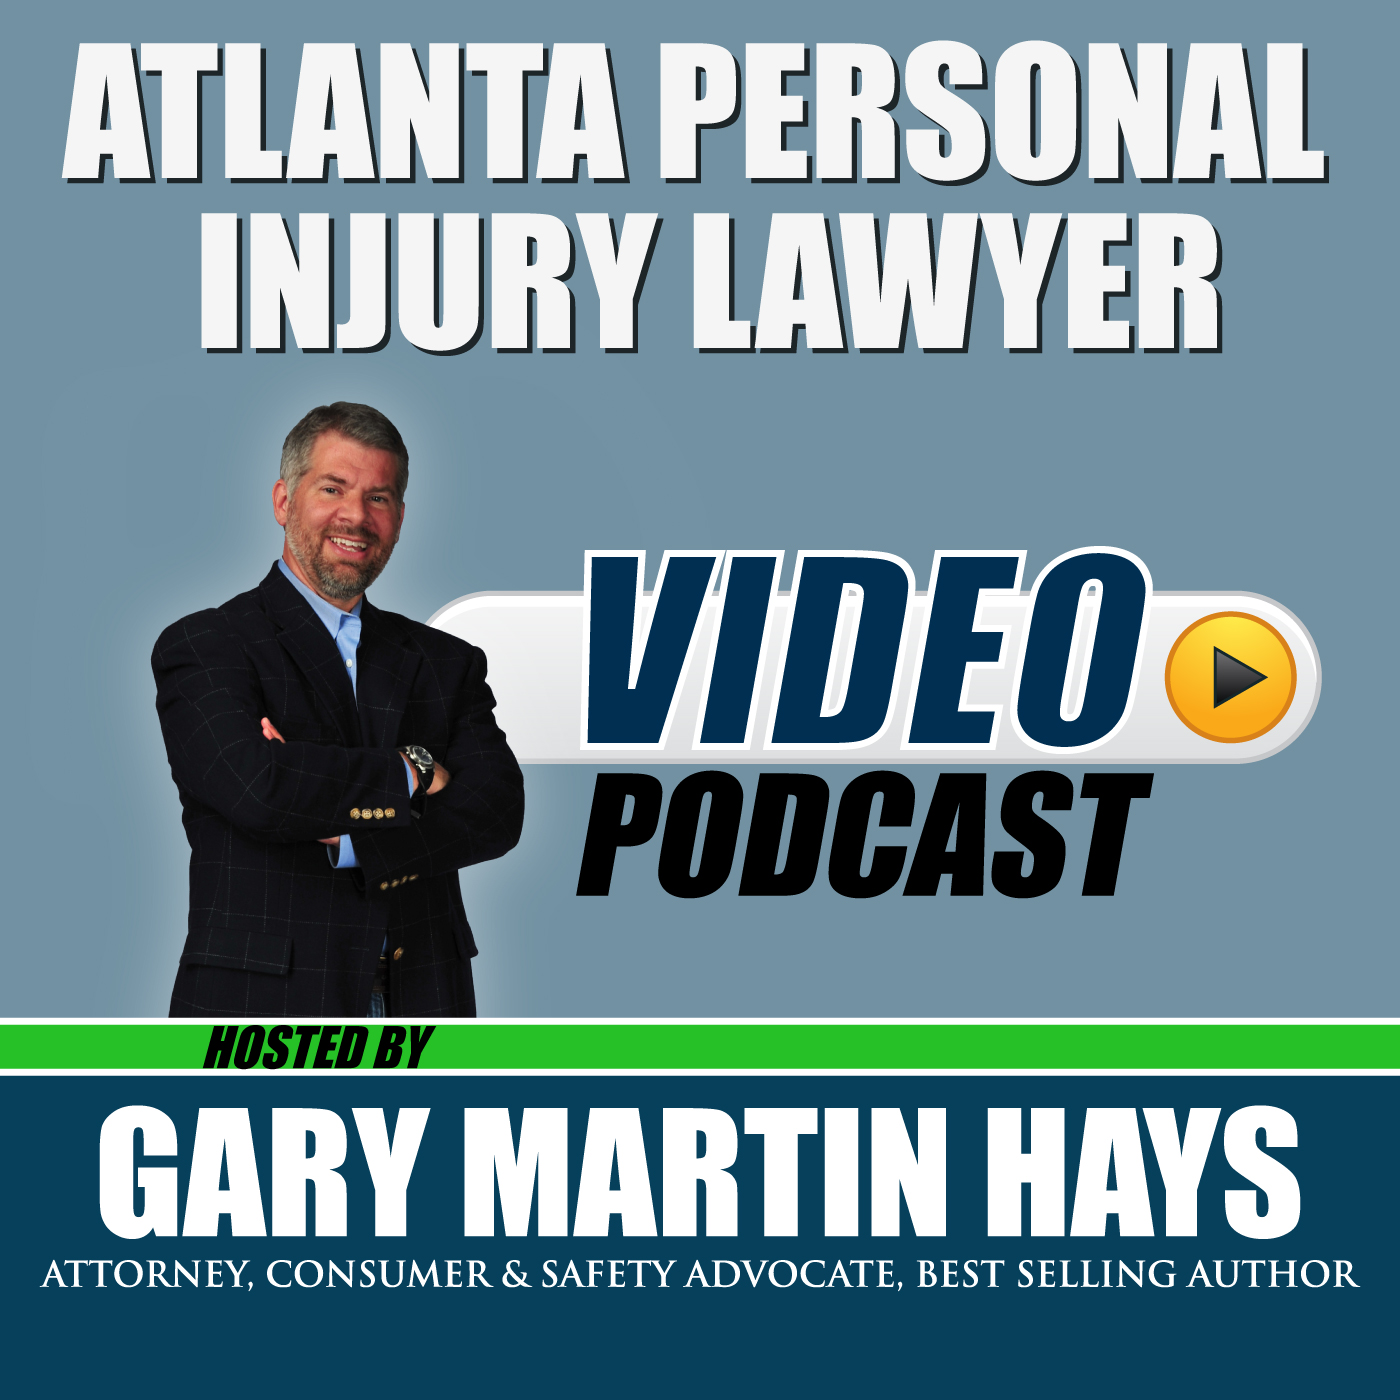 Atlanta Personal Injury Lawyer Podcast